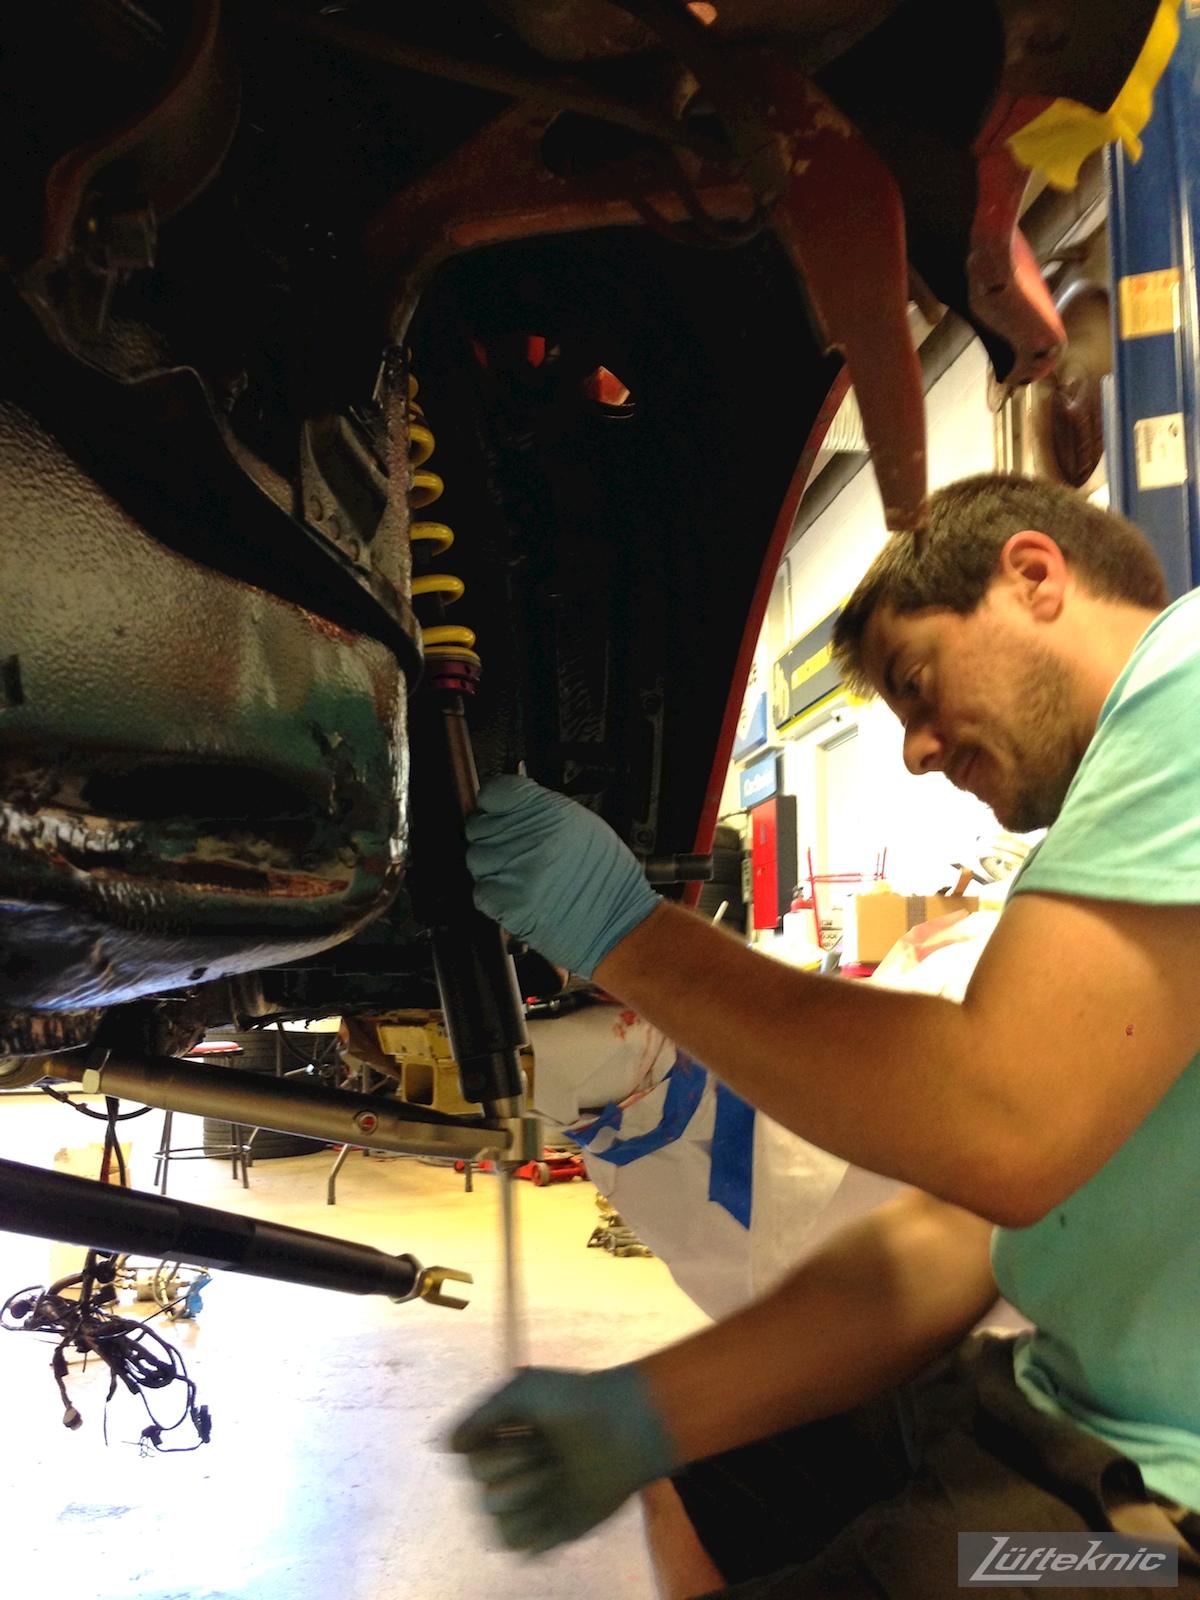 A Lüfteknic employee works on the #projectstuka Porsche 930 Turbo suspension